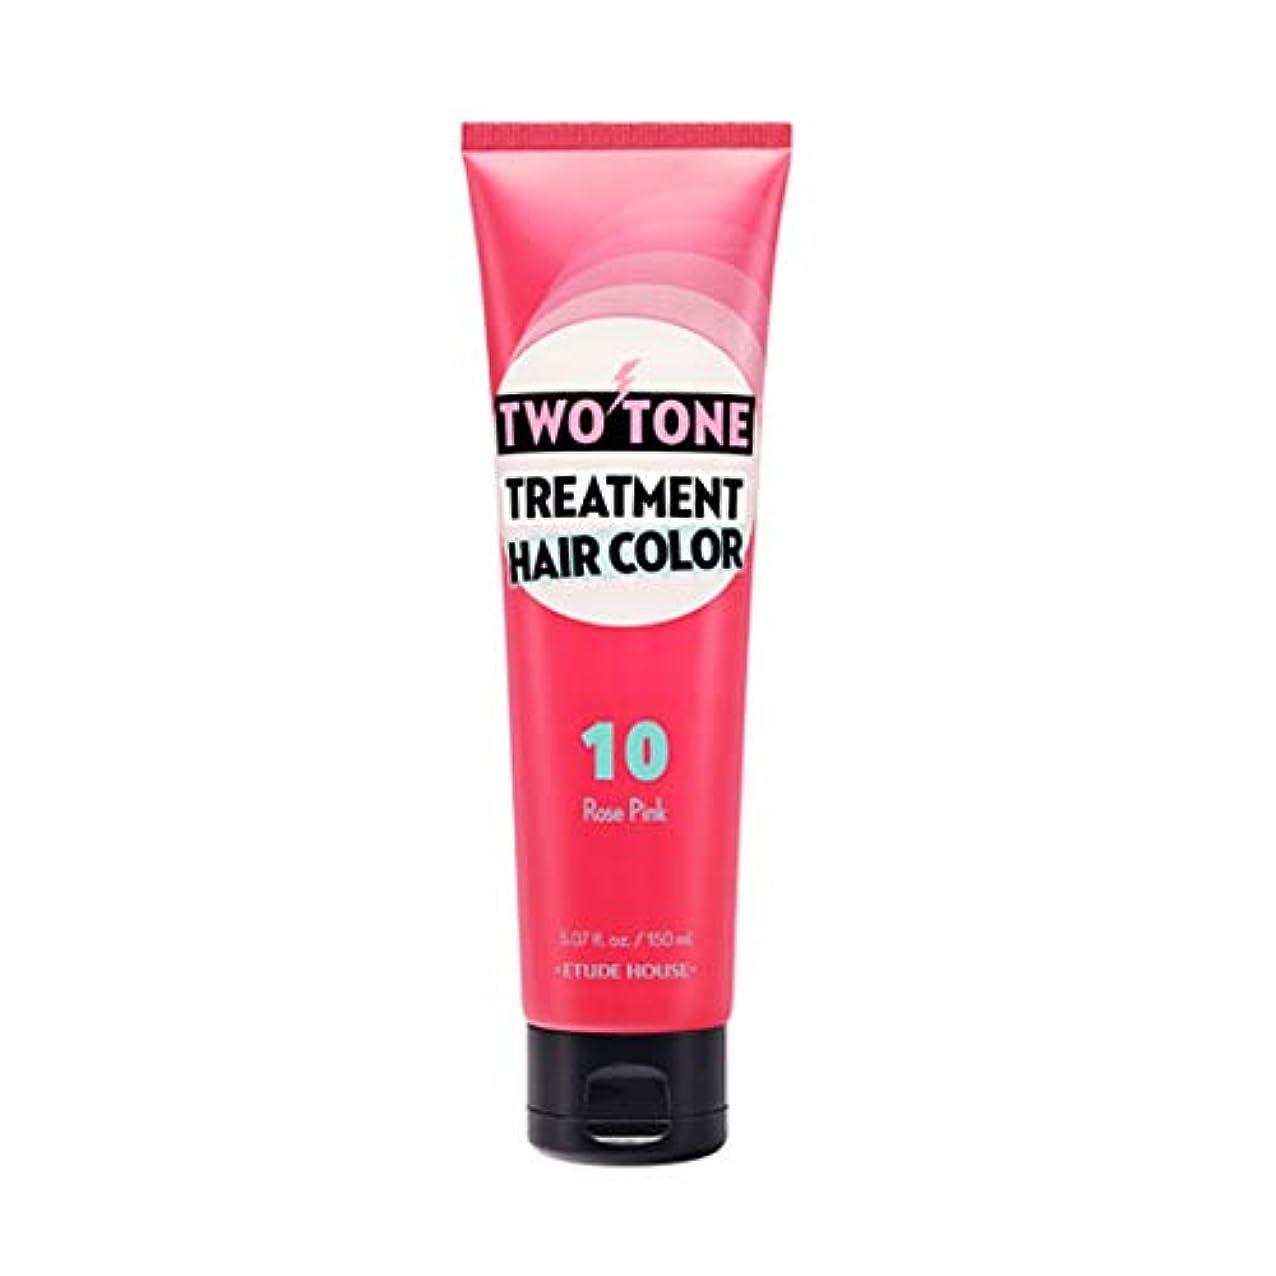 ETUDE HOUSE Two Tone Treatment Hair Color (#10 Rose Pink) エチュードハウス ツートントリートメントヘアカラー150ml (#10 ローズピンク)